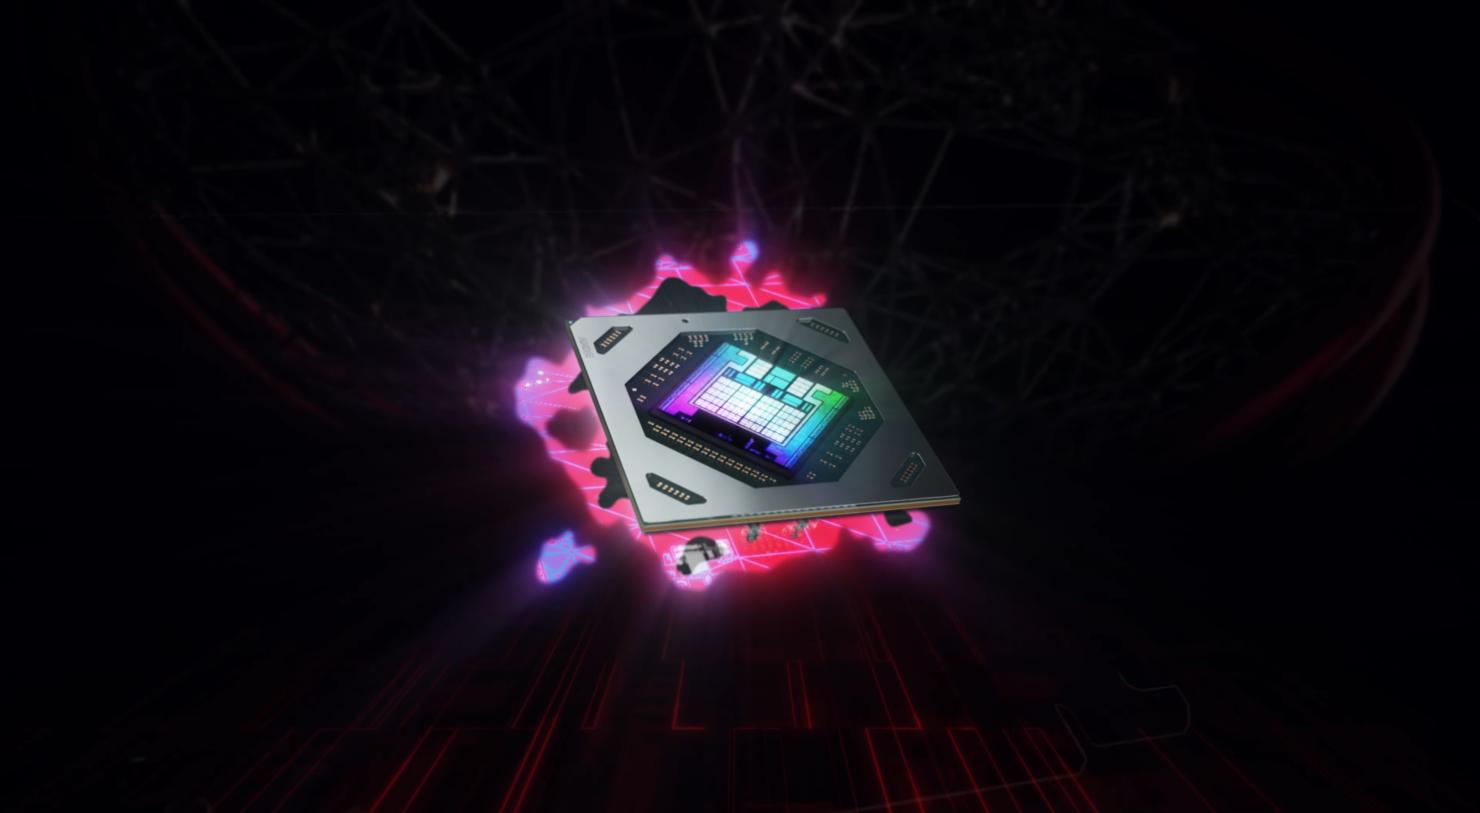 high-end-asus-rog-strix-gaming-notebook-with-amd-radeon-rx-6800m-12-gb-discrete-gpu-&-ryzen-9-5900hx-cpu-spotted